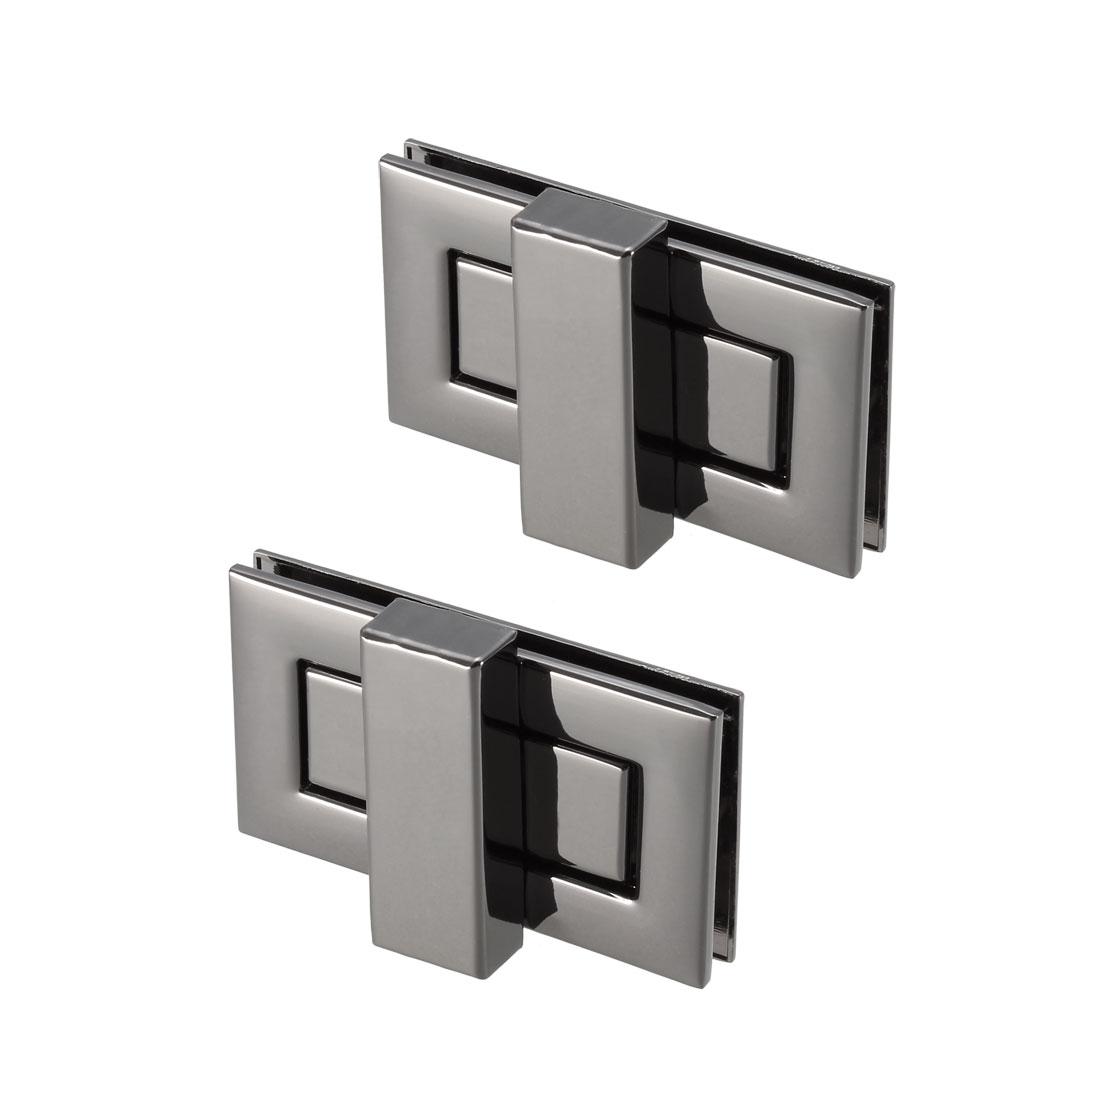 2 Sets Rectangular Purses Twist Lock 52mm x 29mm Clutches Closures - Black